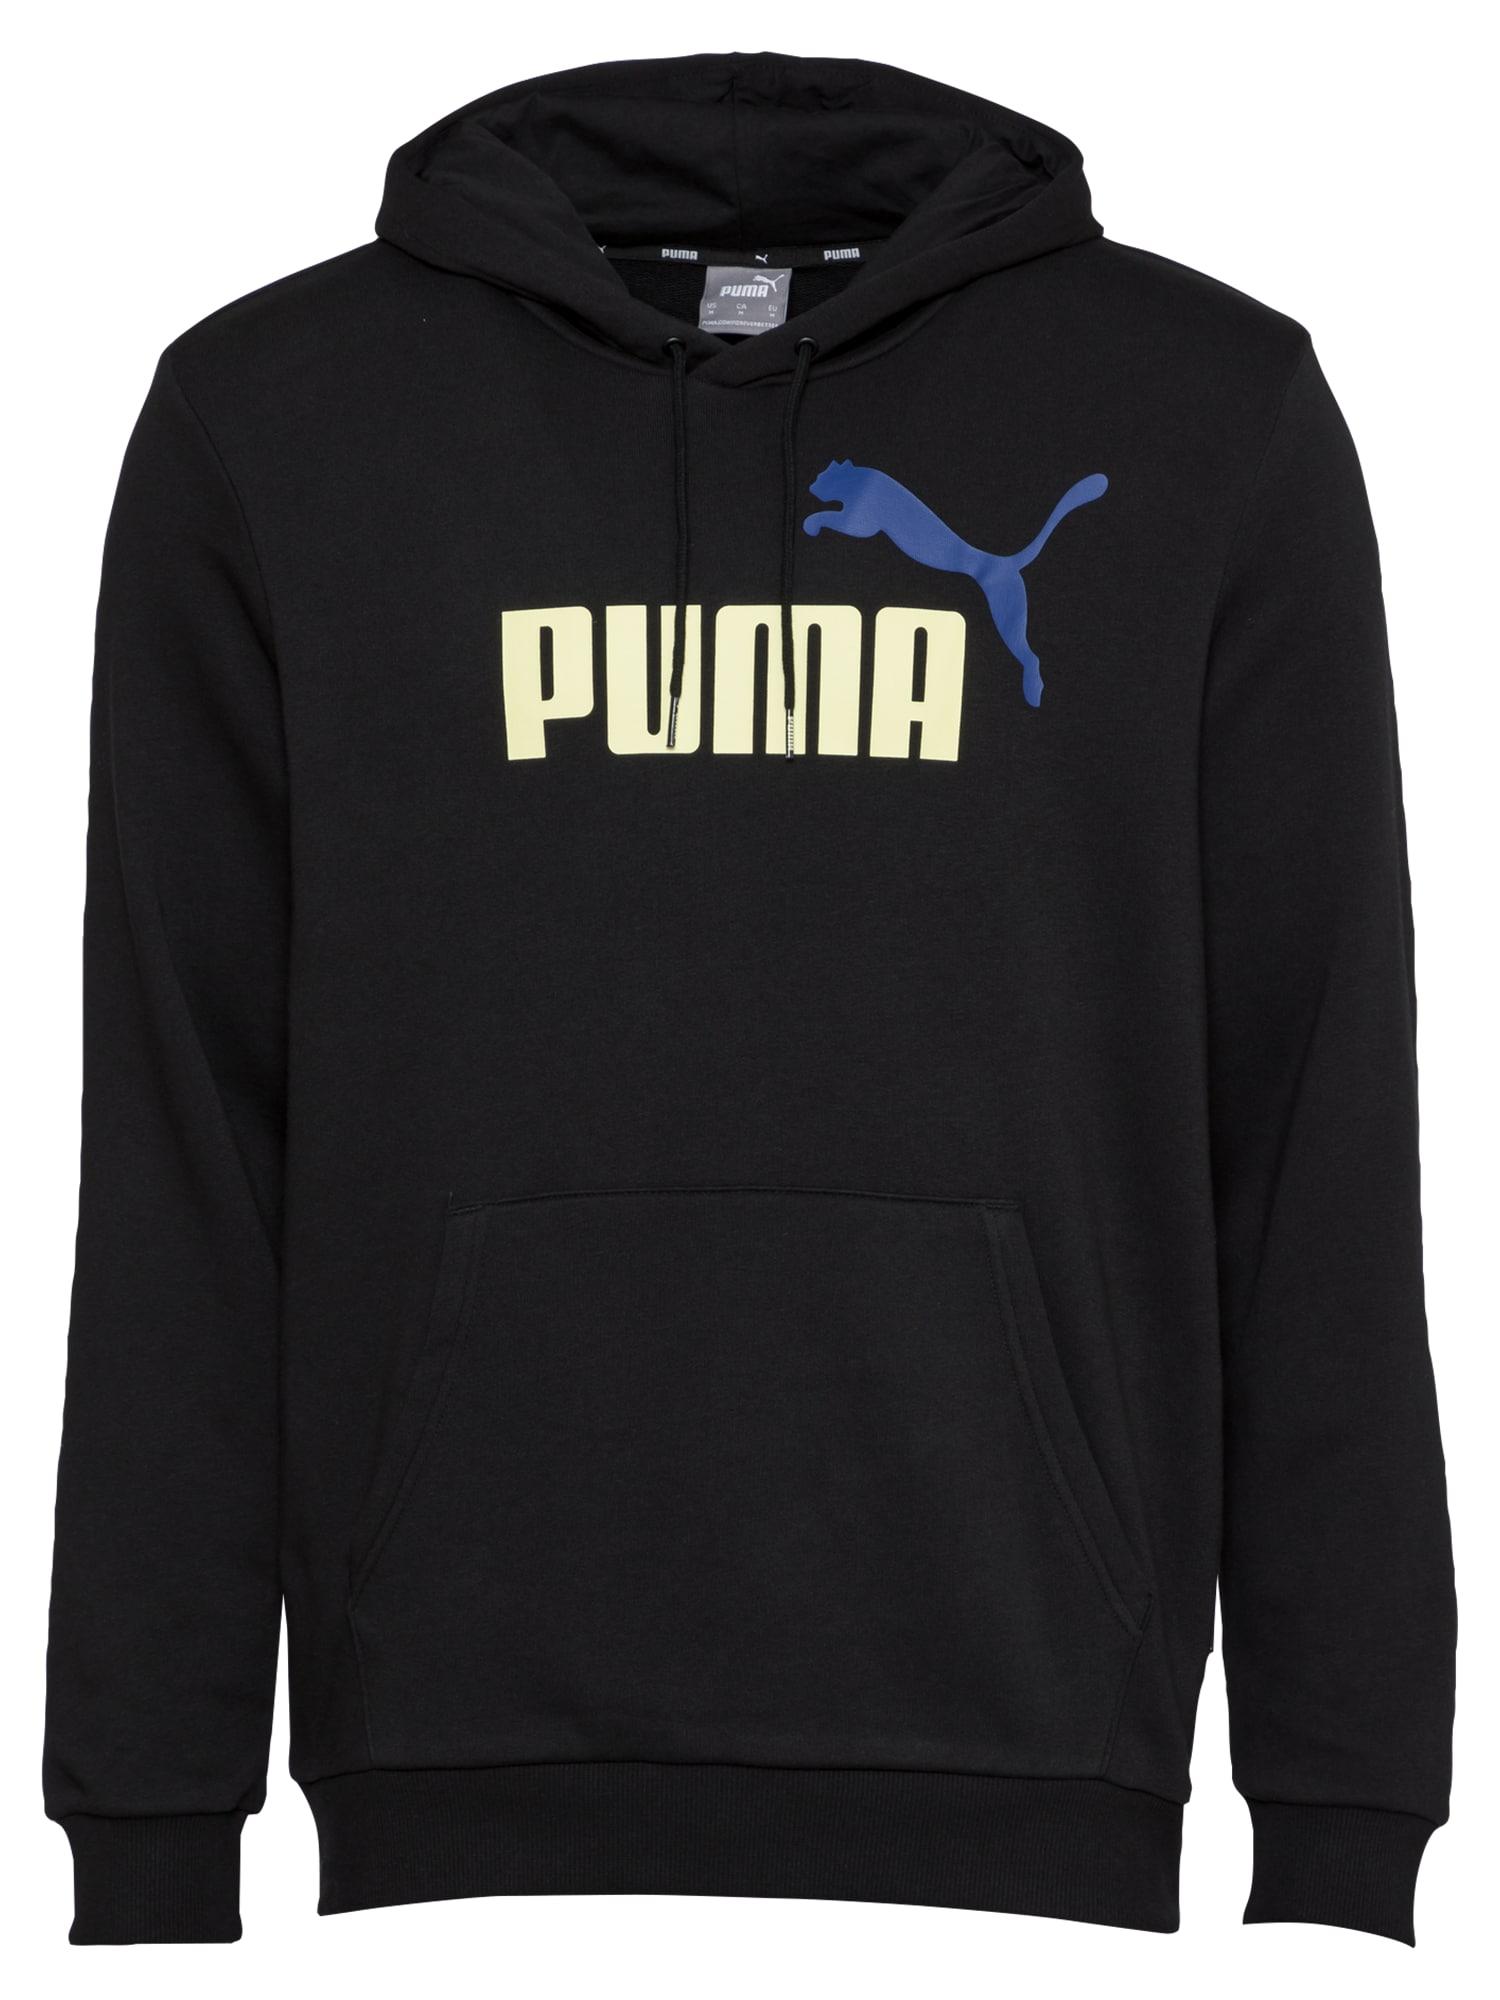 "PUMA Sportinio tipo megztinis juoda / sodri mėlyna (""karališka"") / balta"